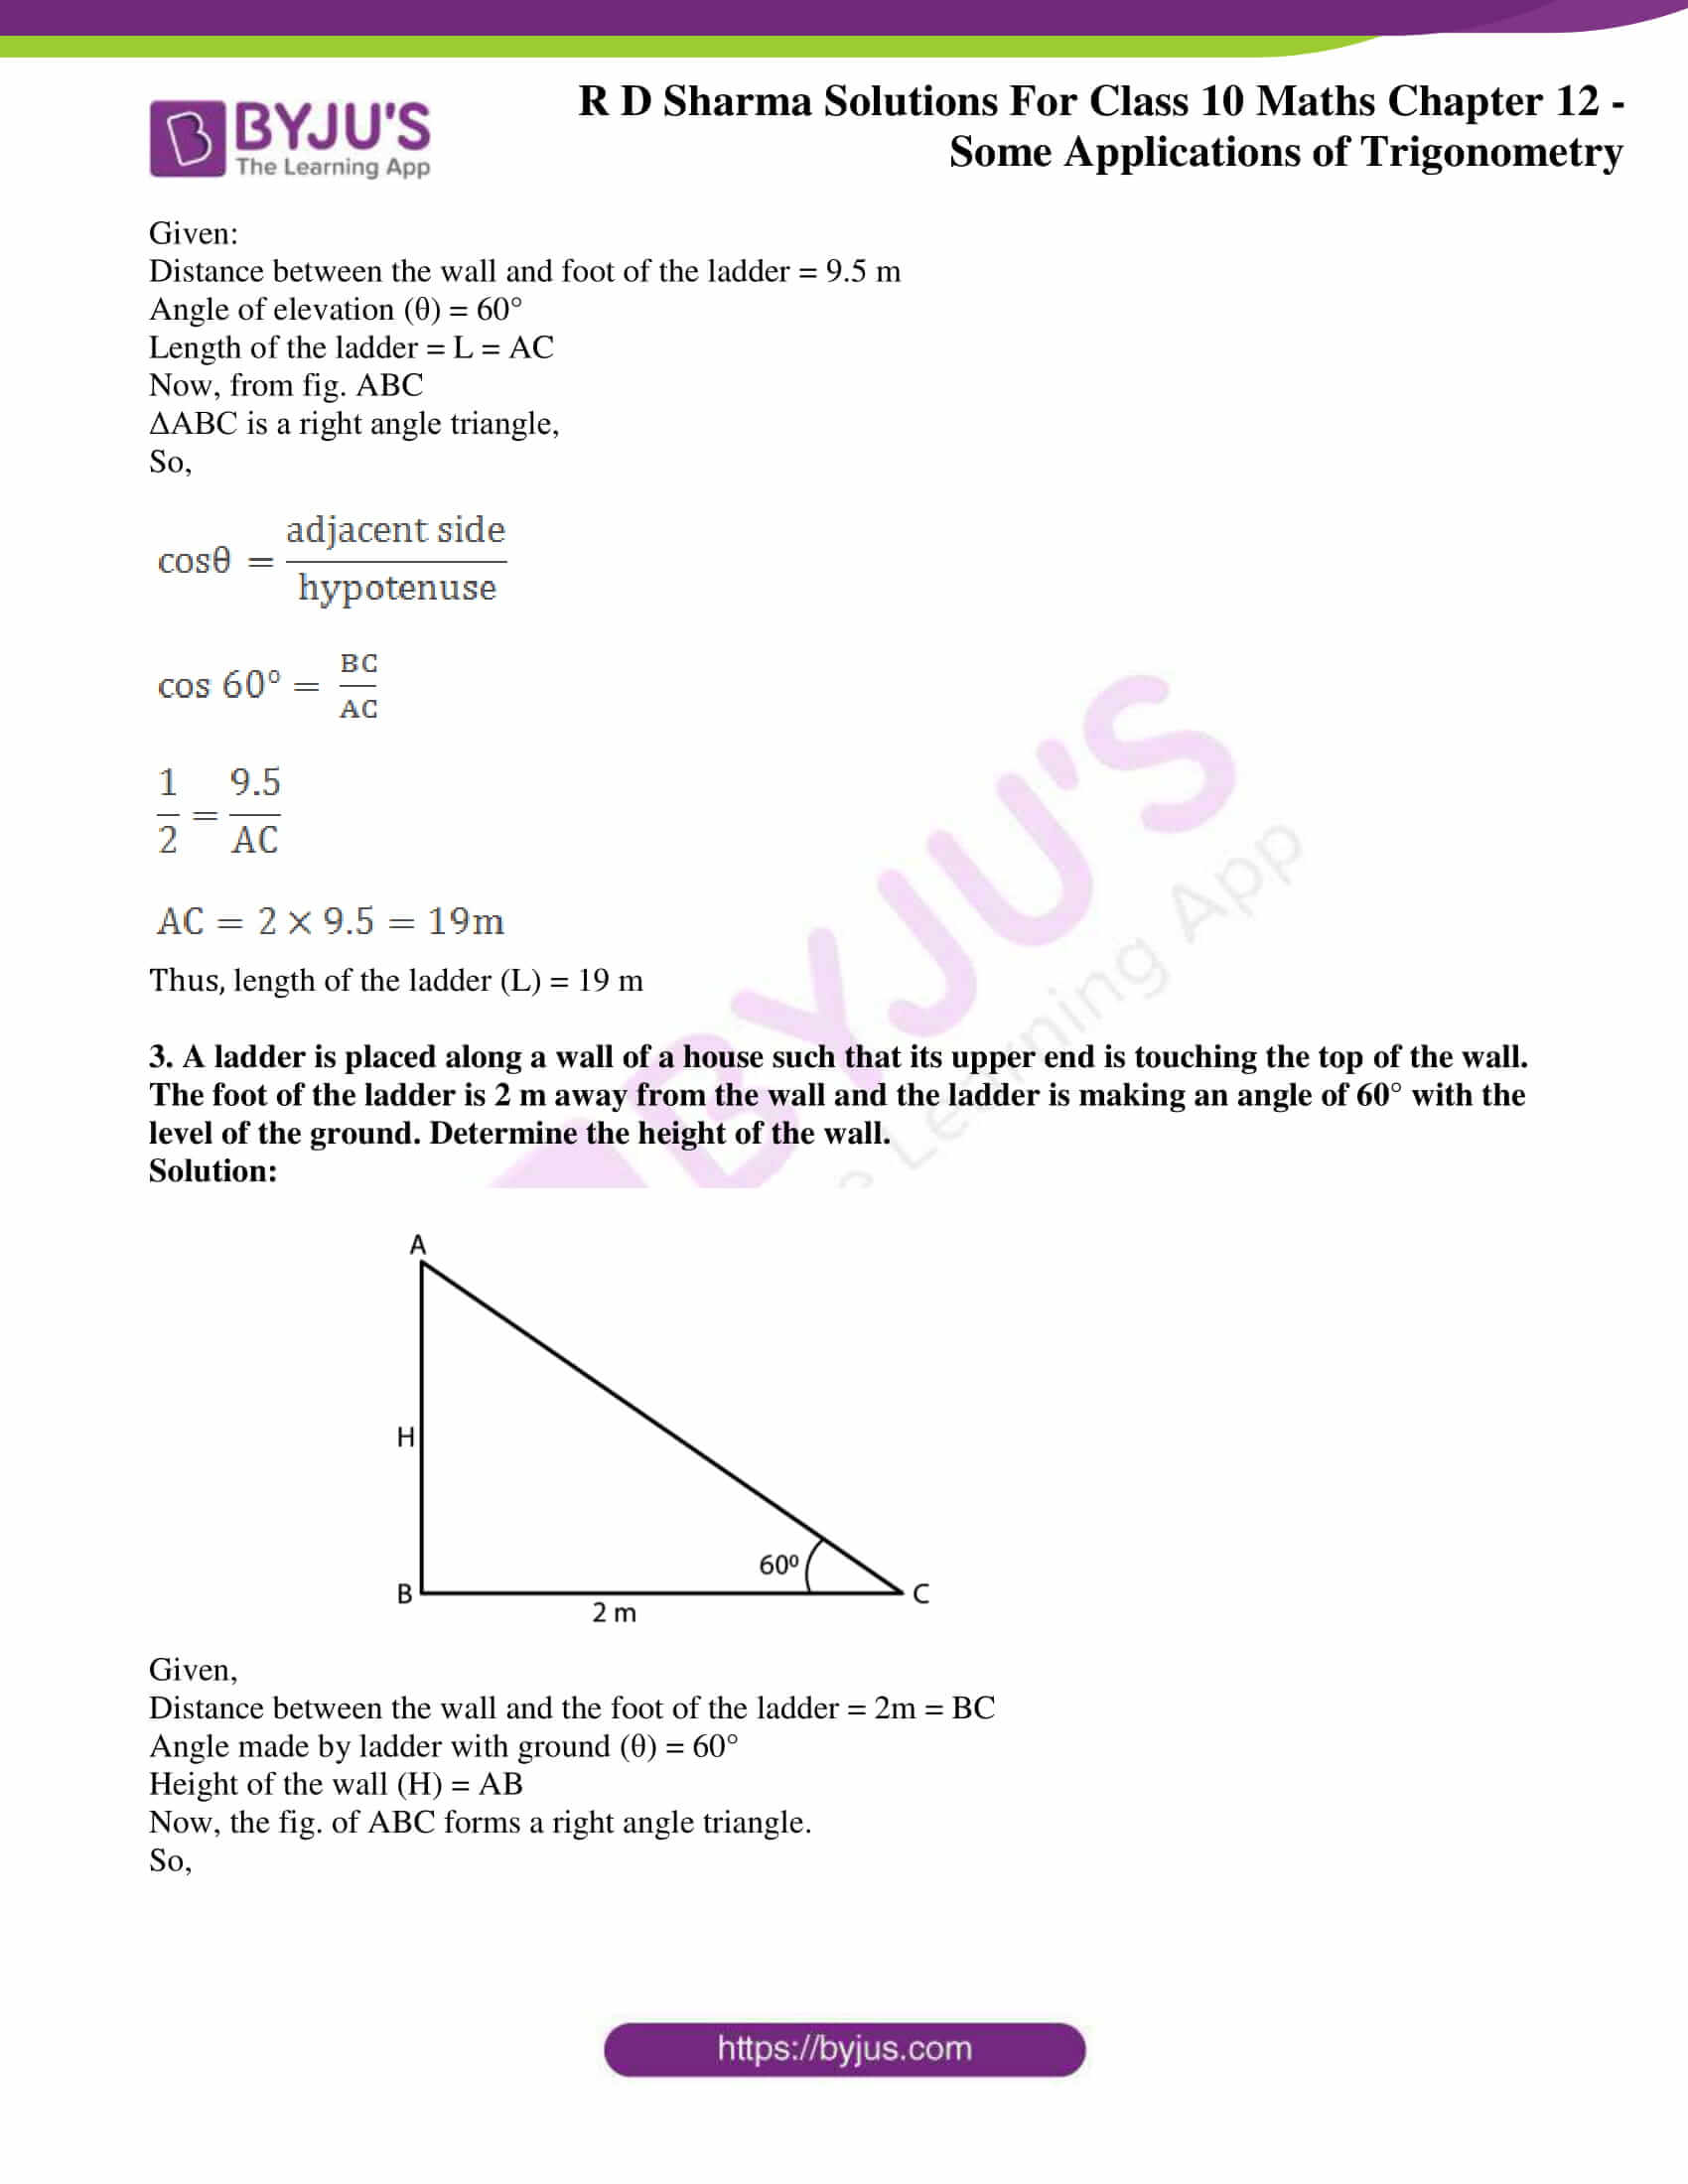 rd sharma class 10 chapter 12 applications trigonometry solutions 02